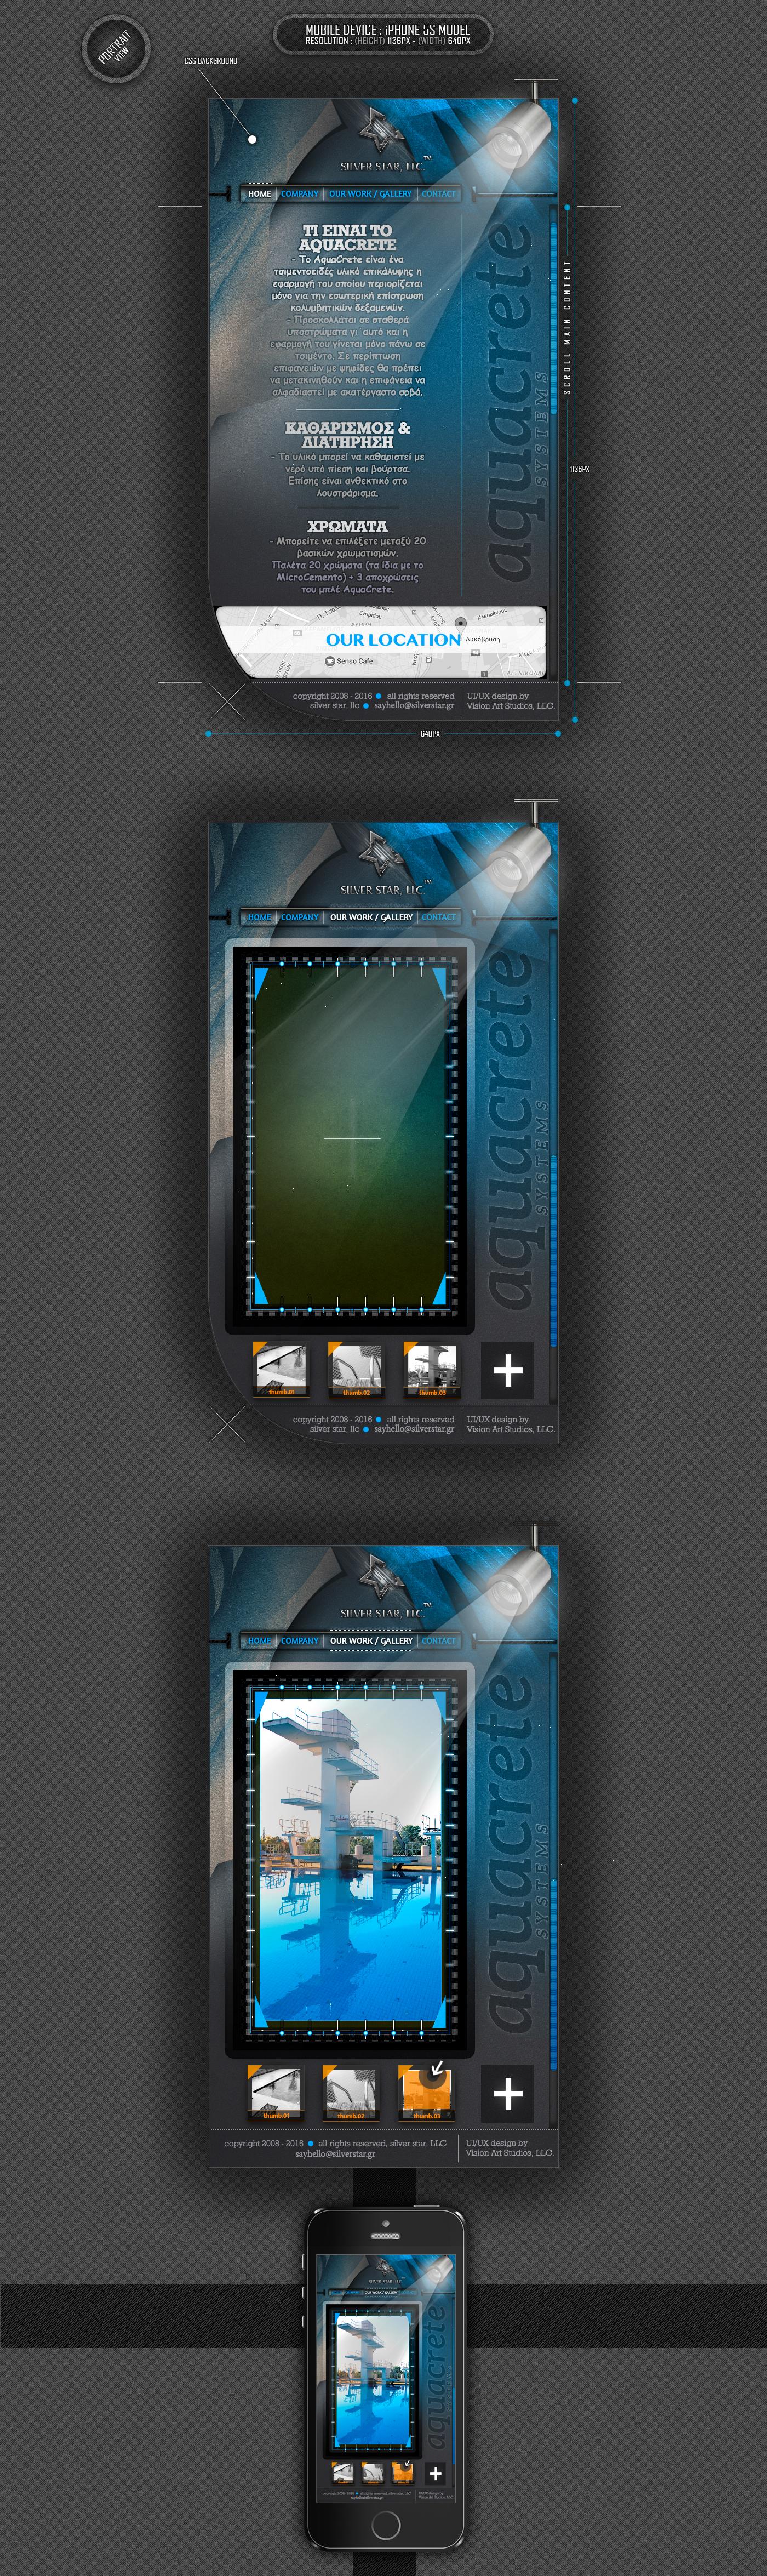 konstantinos papalazarou papalazarou konstantinos visionartstudios vision art studios Silver Star swimming pools vision art UI ux ui design UX design Responsive Design mobile design css3 html5